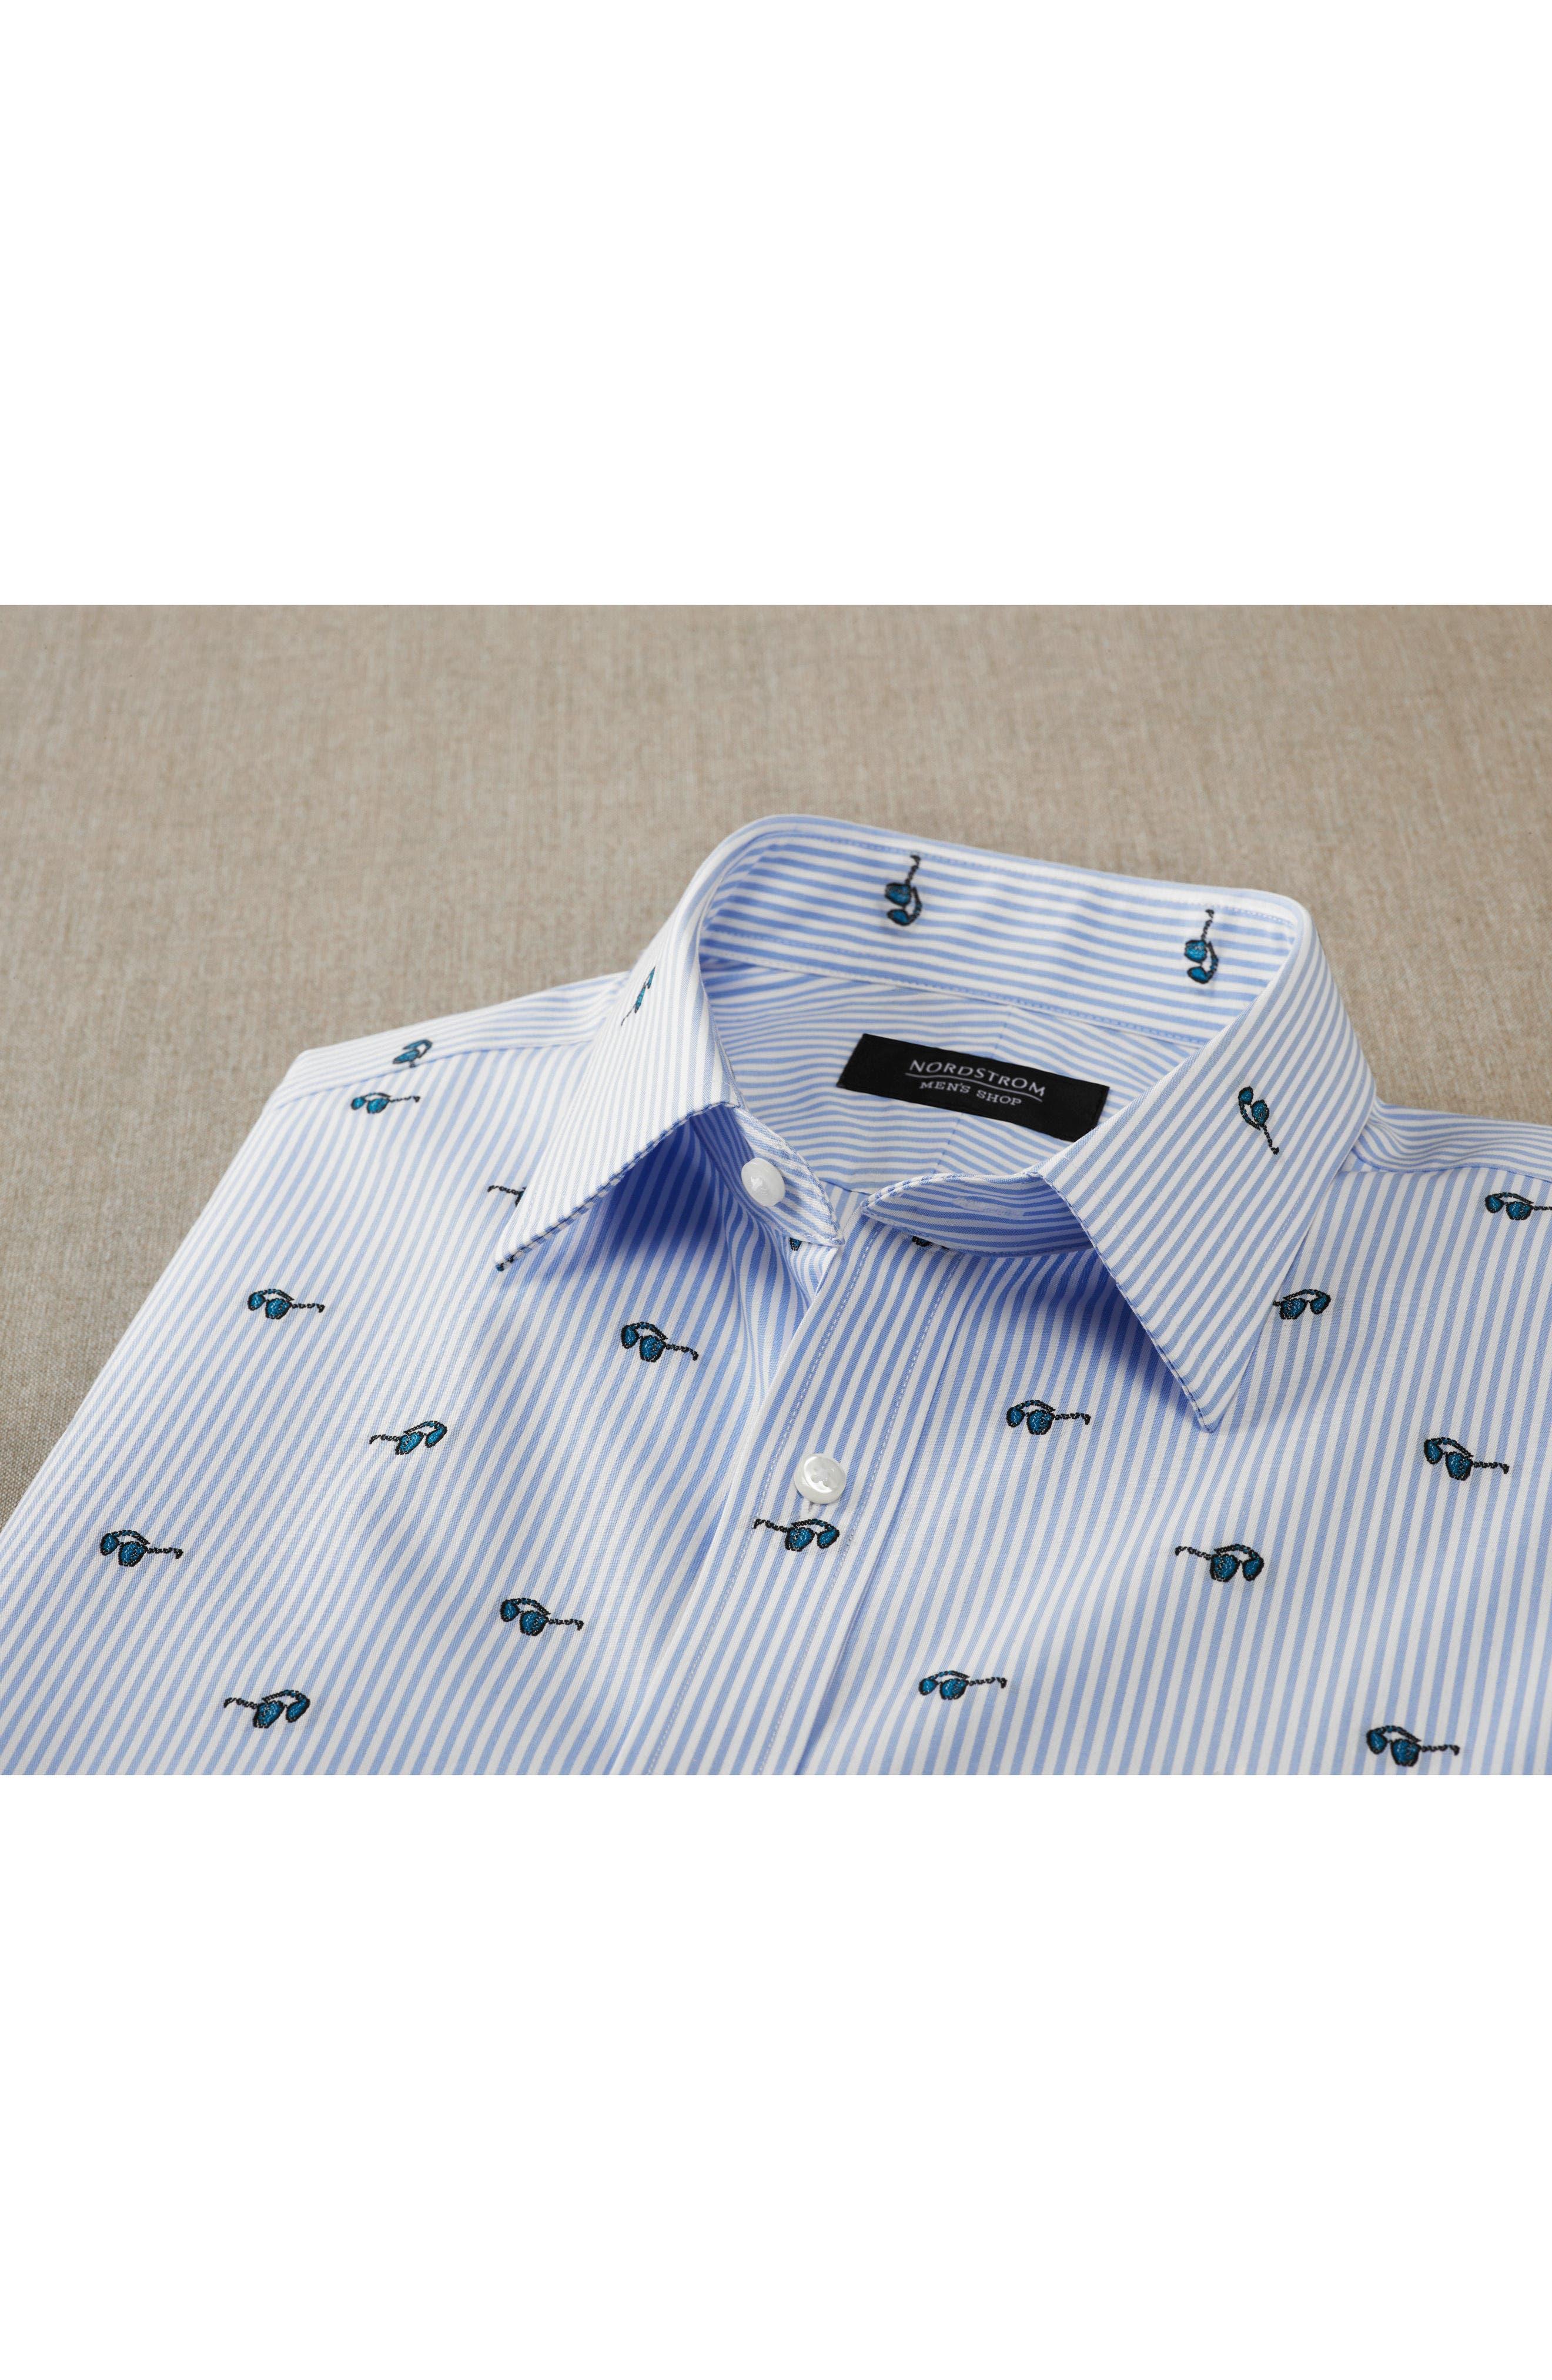 Alternate Image 4  - Nordstrom Men's Shop Trim Fit Sunglasses Print Dress Shirt